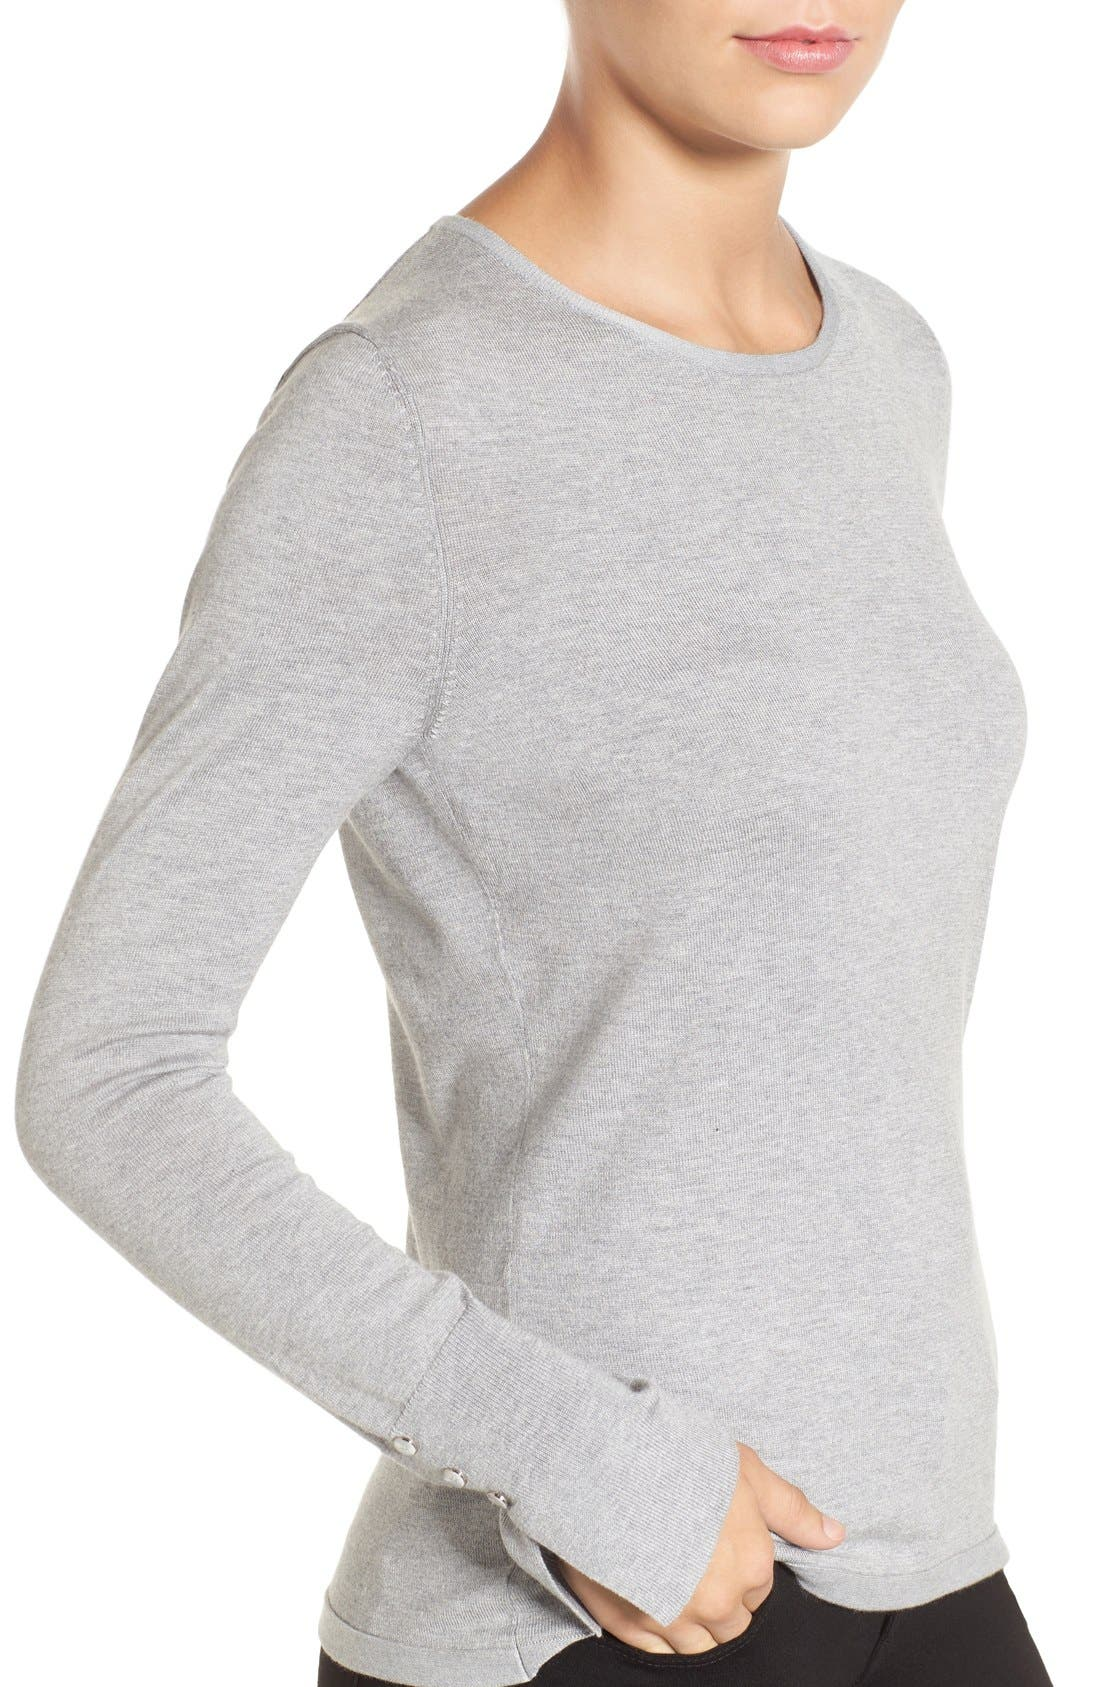 Cuff Detail Silk Blend Crewneck Sweater,                             Alternate thumbnail 4, color,                             030